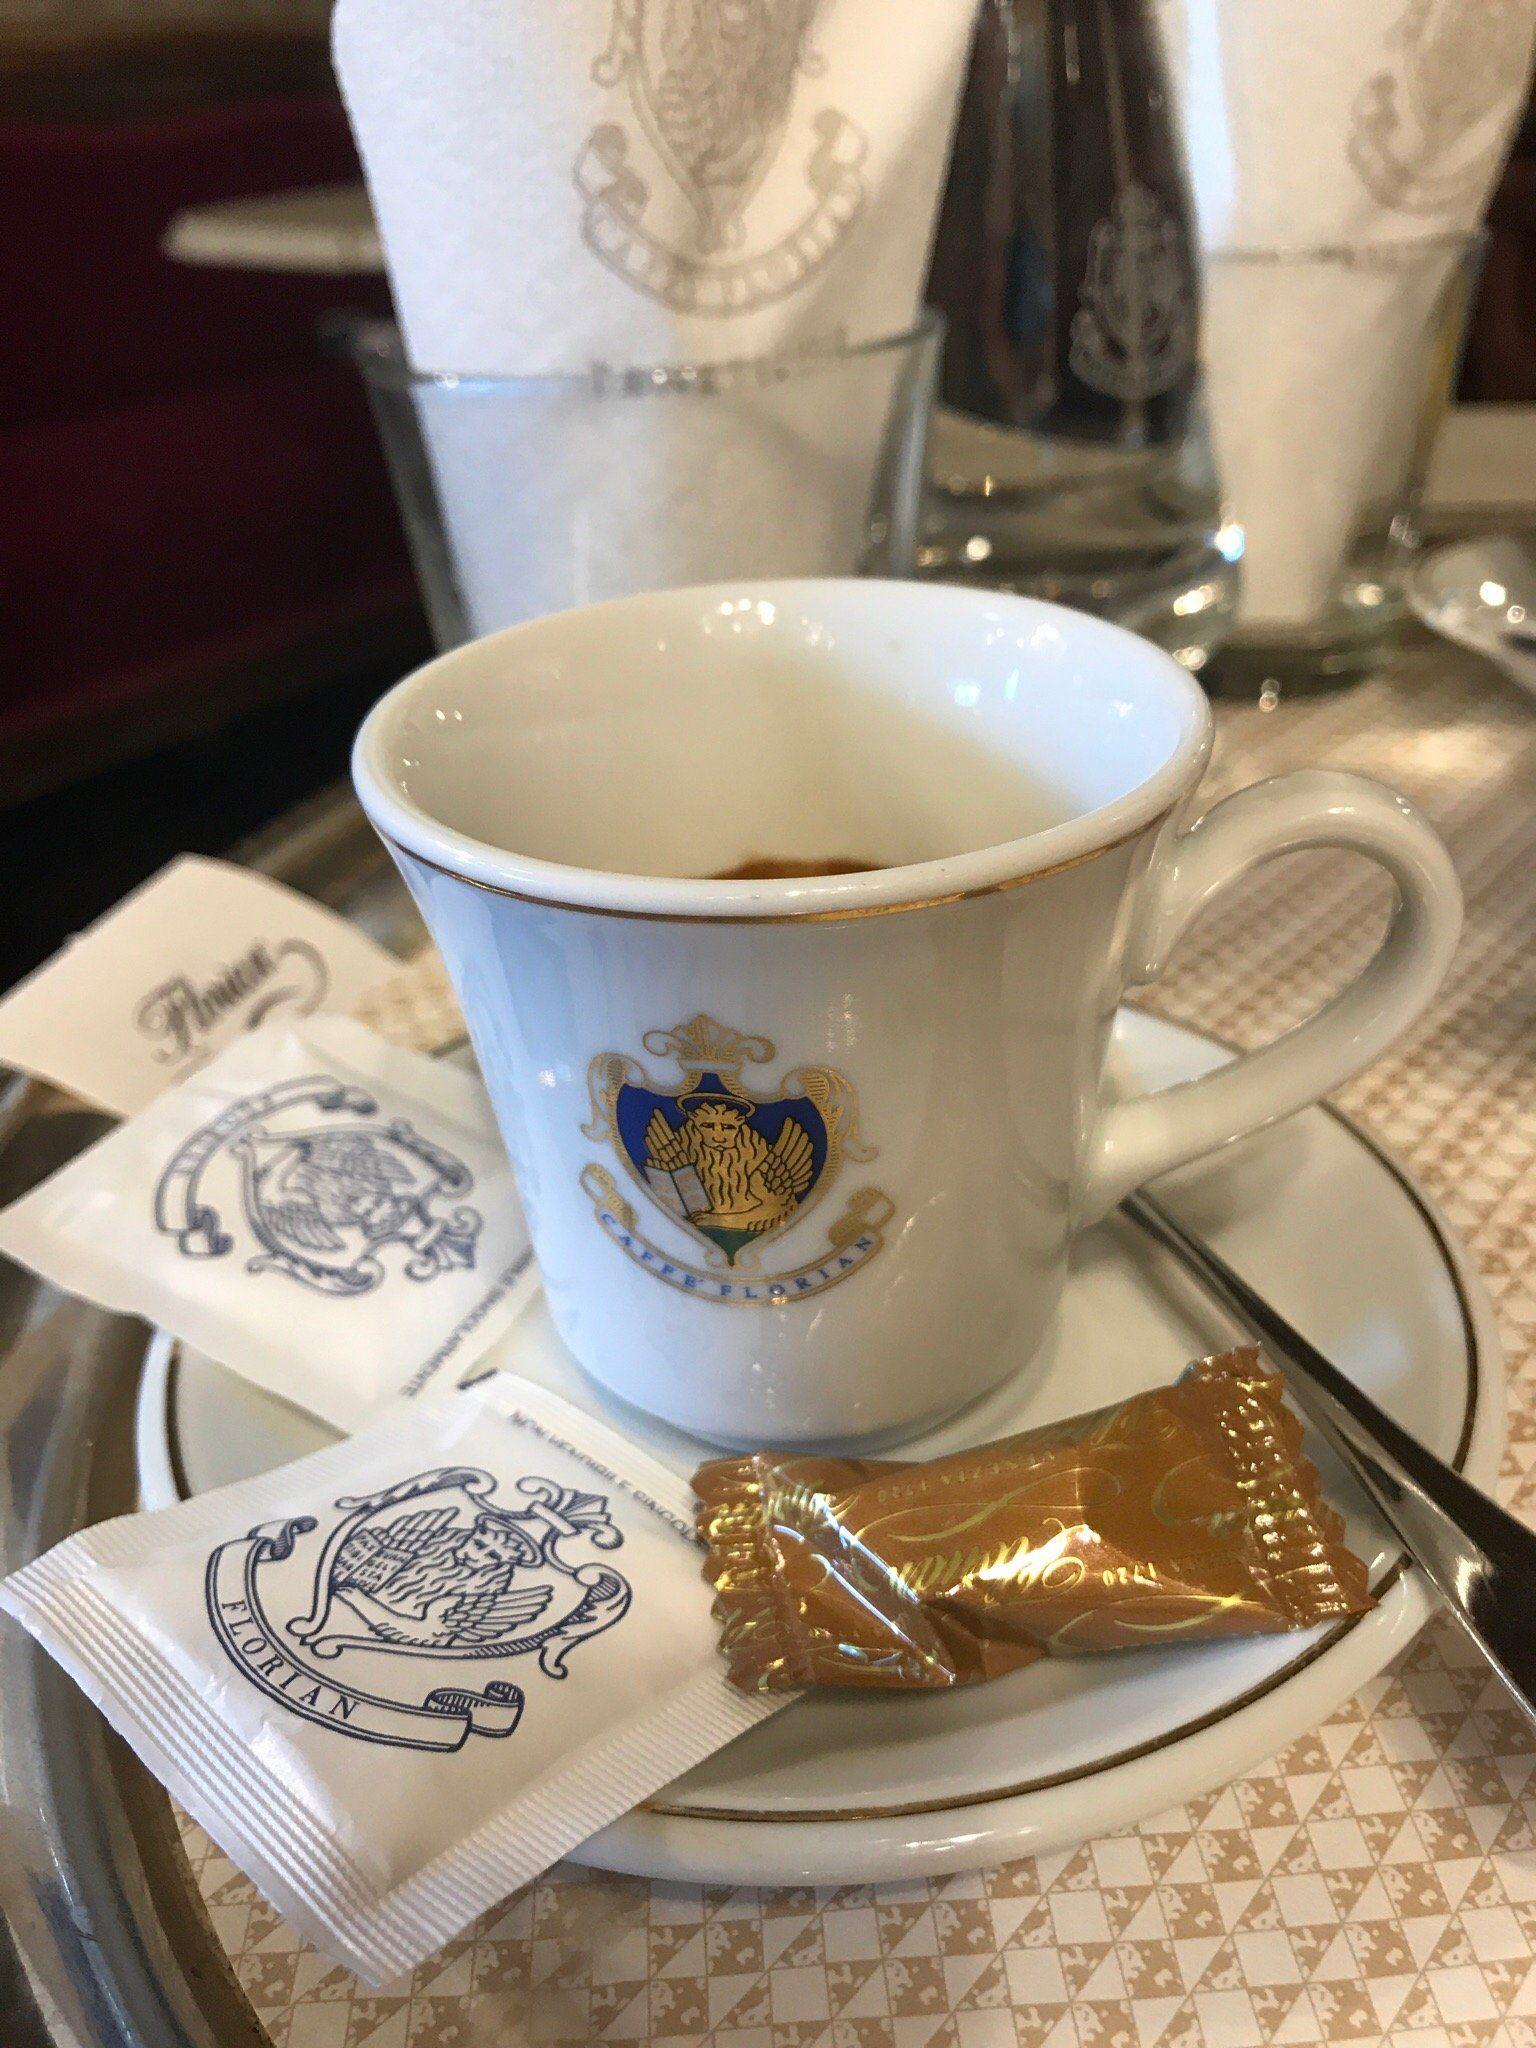 Caffe Florian Venezia, Venecia - San Marco